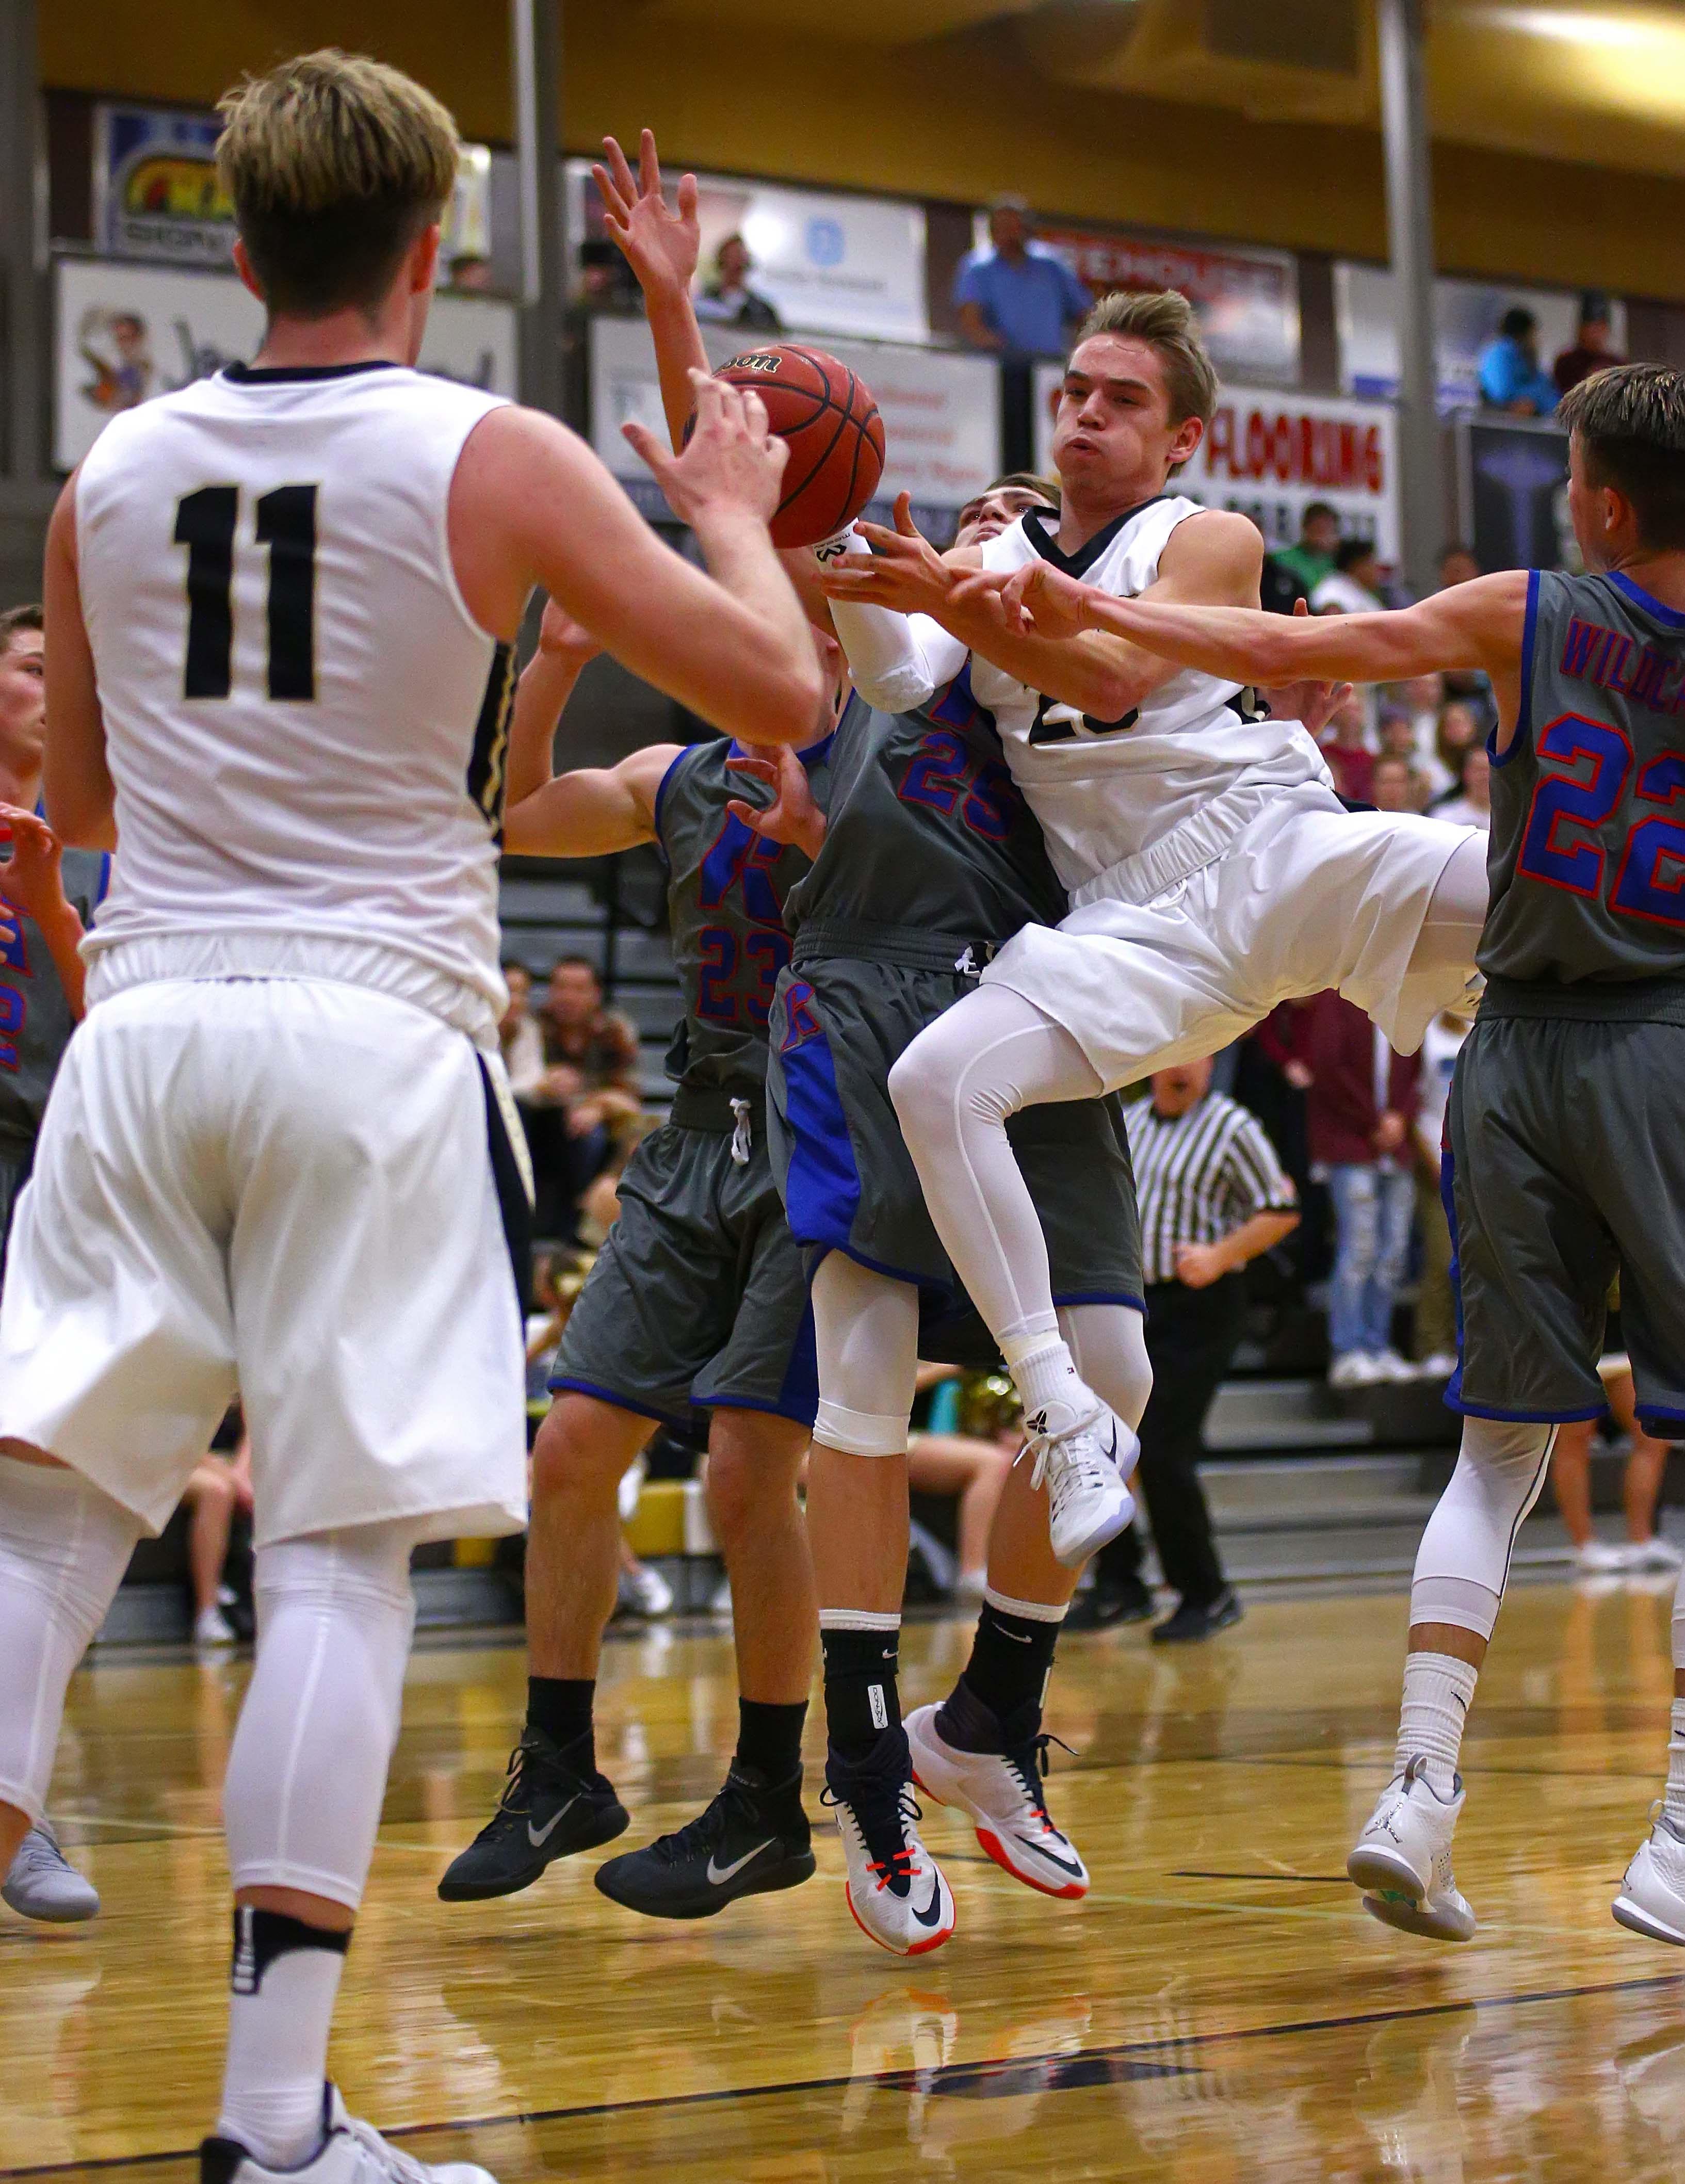 Desert Hills' Logan Hokanson (23), Desert Hills vs. Richfield, Boys Basketball, St. George, Utah, Jan. 6, 2017, | Photo by Robert Hoppie, ASPpix.com, St. George News